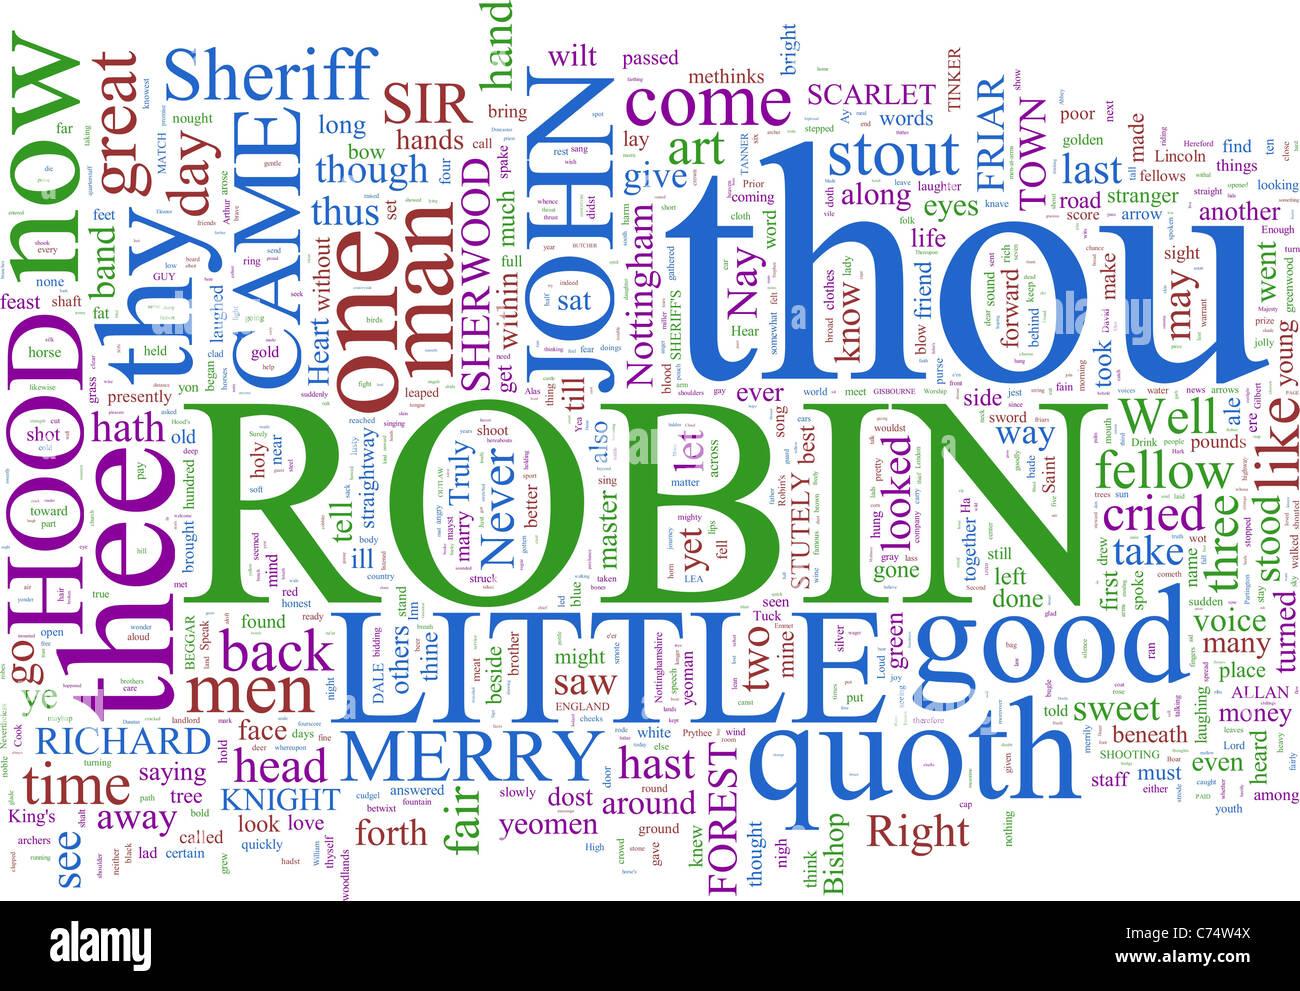 A word cloud based on Robin Hood - Stock Image